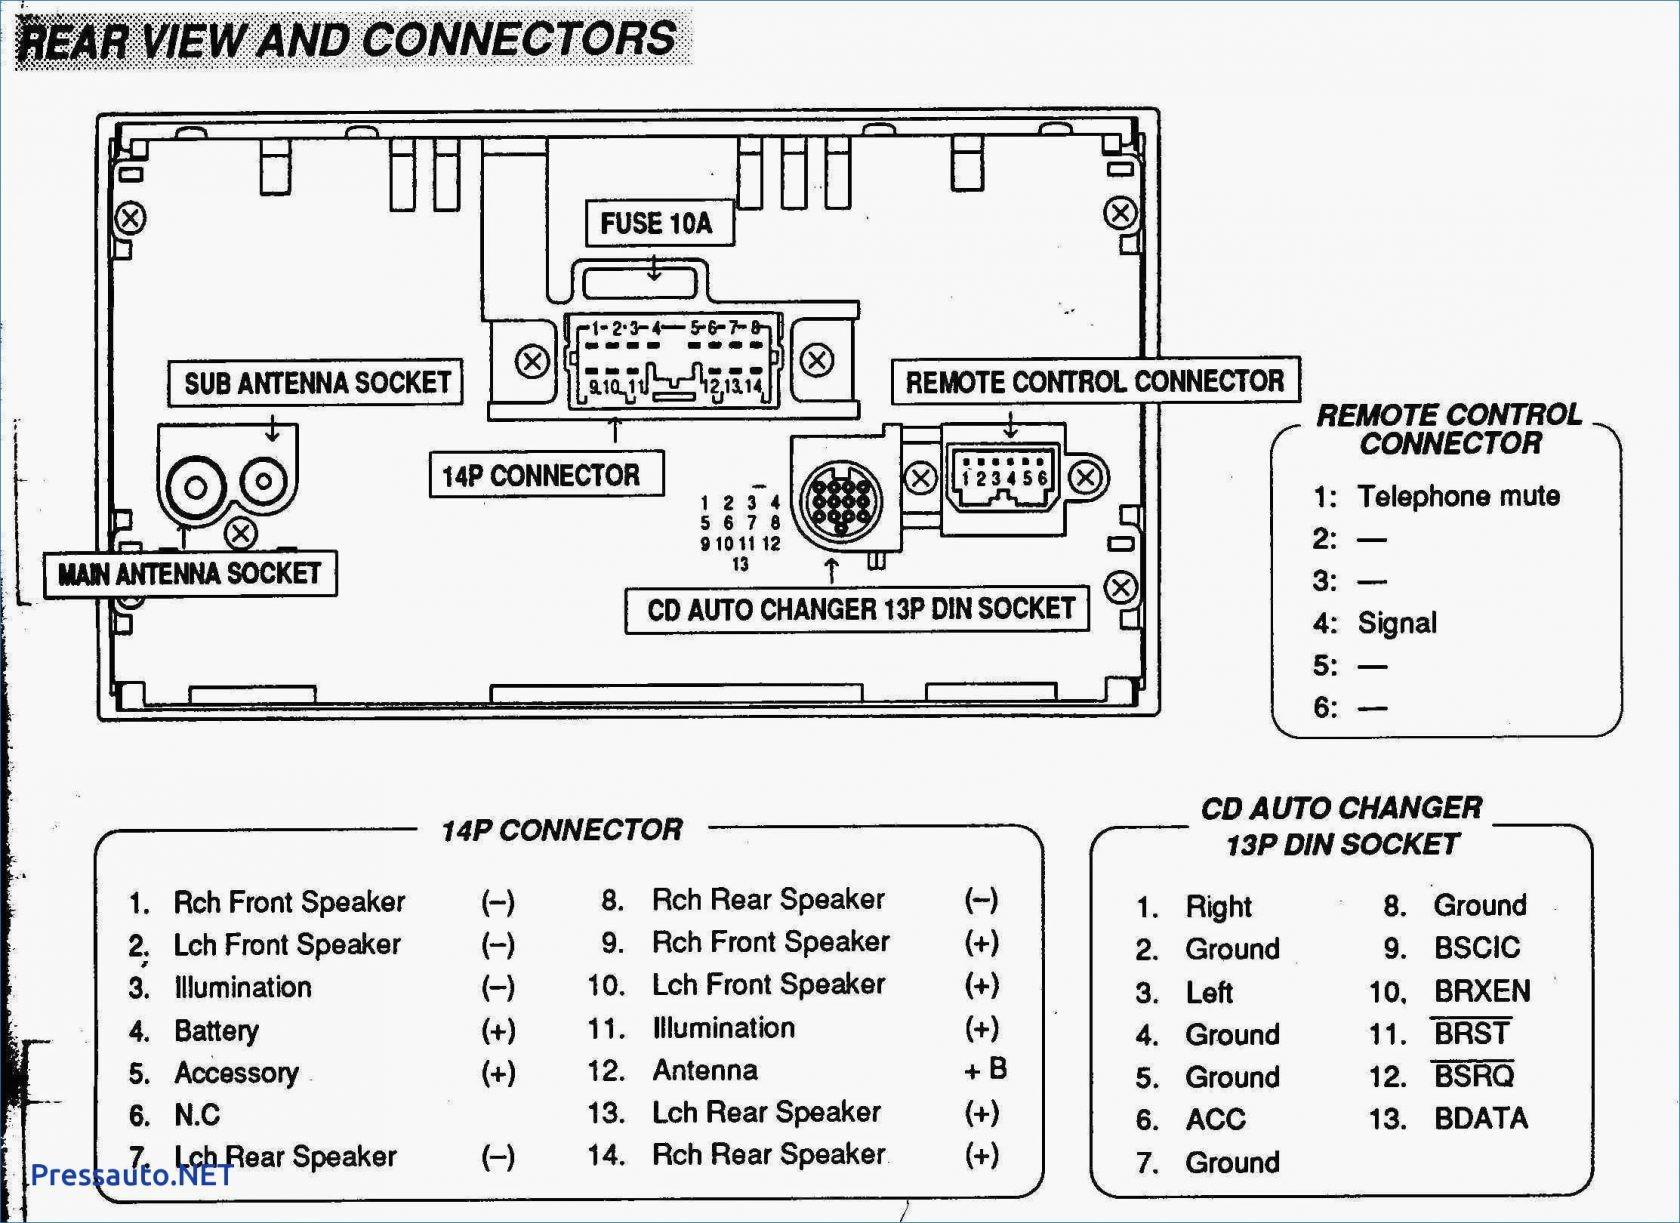 2000 Vw Jetta 2 0 Engine Diagram 2 Vw Jetta Wiring Diagram Wiring Diagram Of 2000 Vw Jetta 2 0 Engine Diagram 2